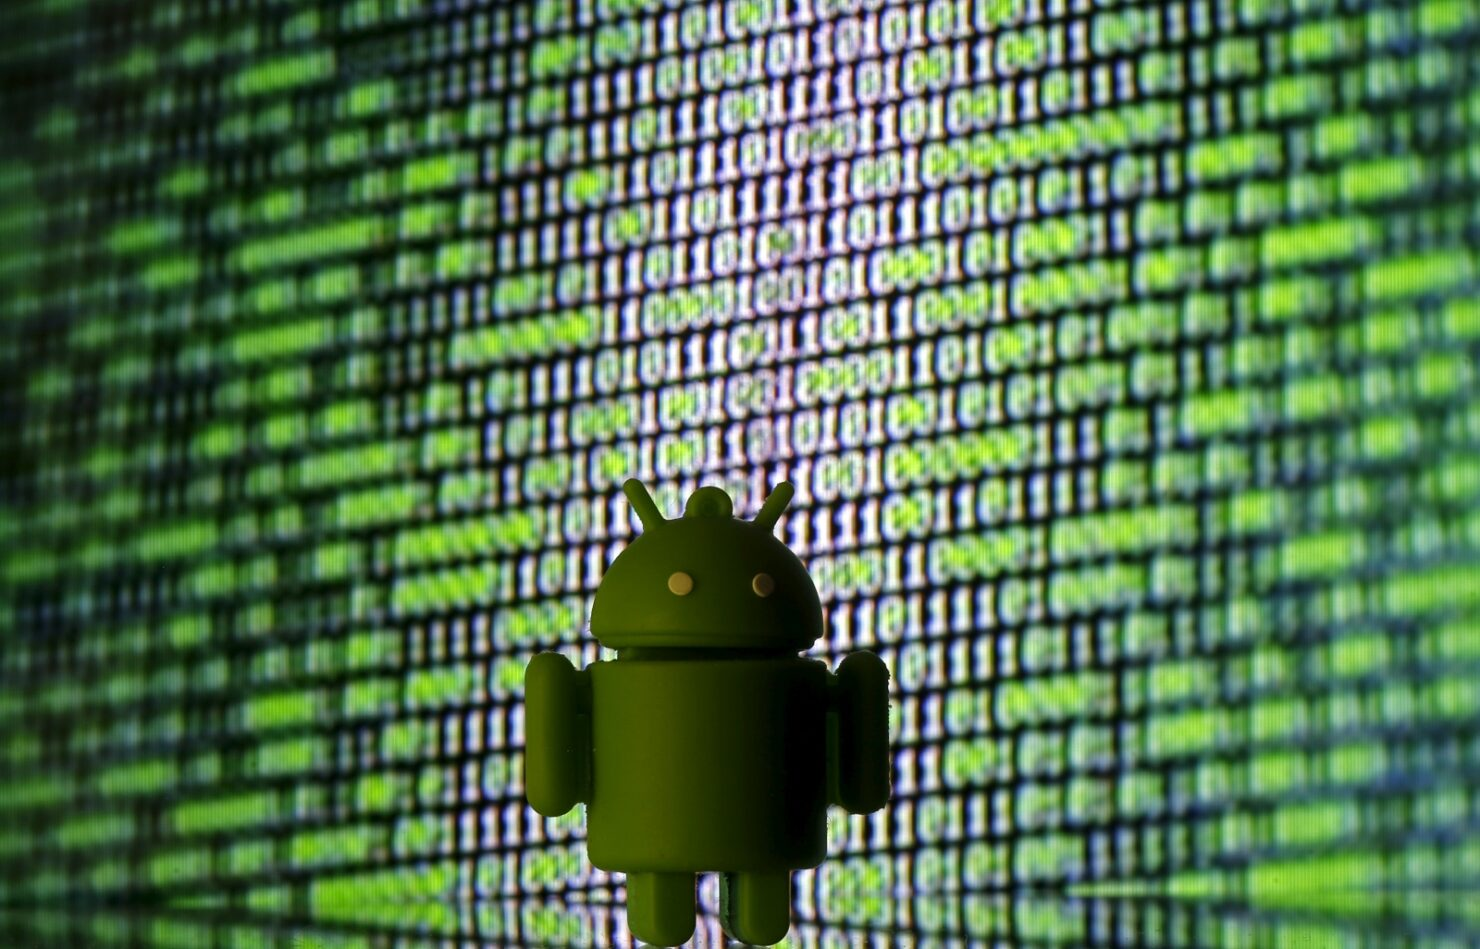 Android banking trojan google safe browsing bankbot marcher banking trojan